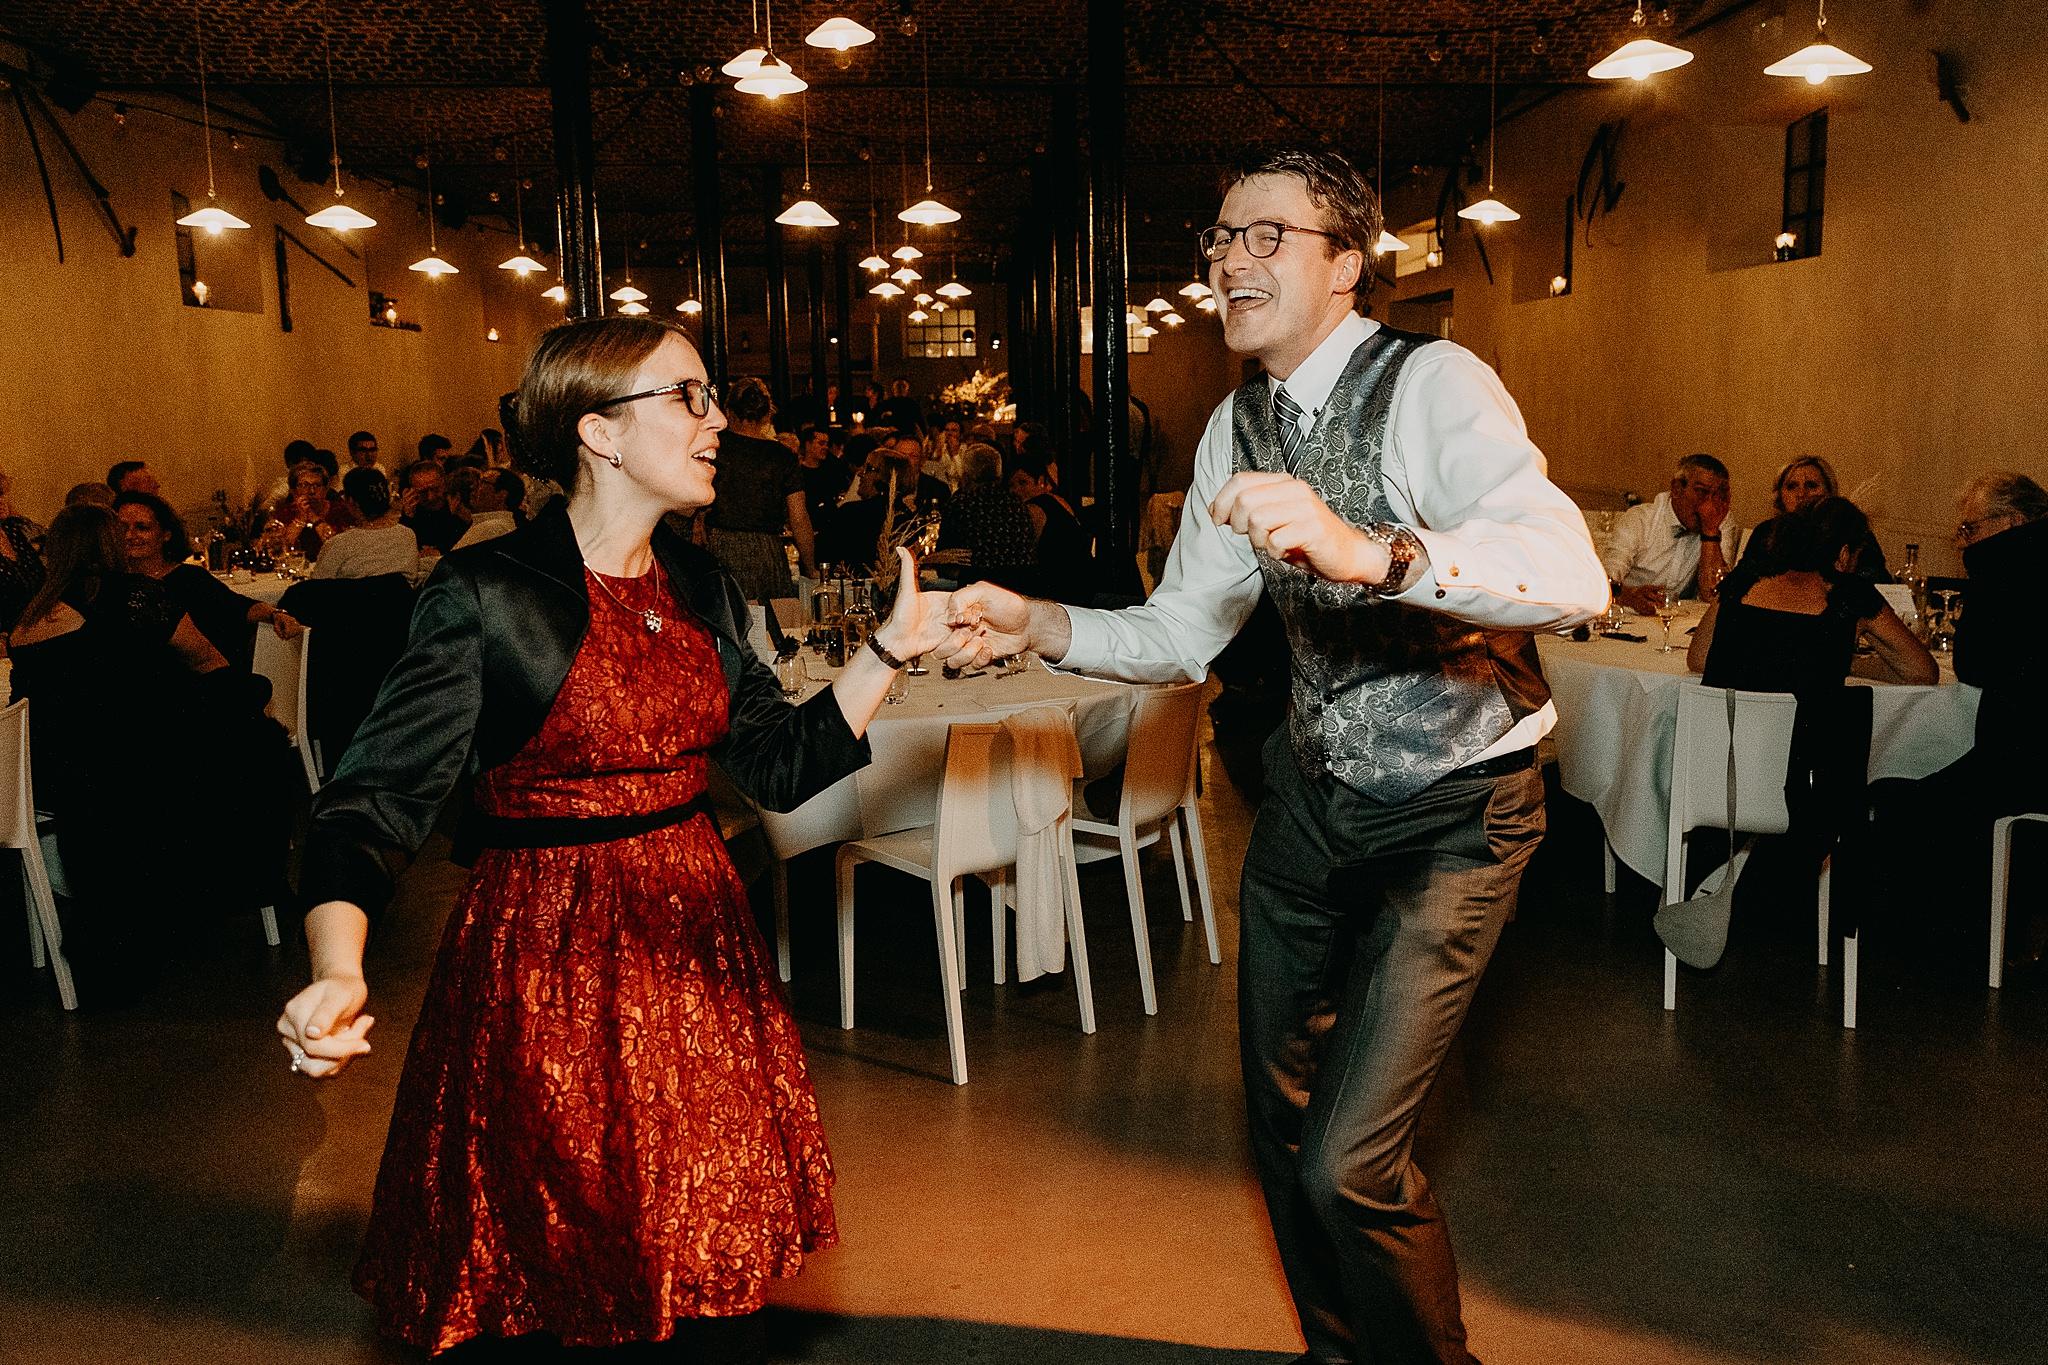 Aulnenhof Walshoutem trouwfeest